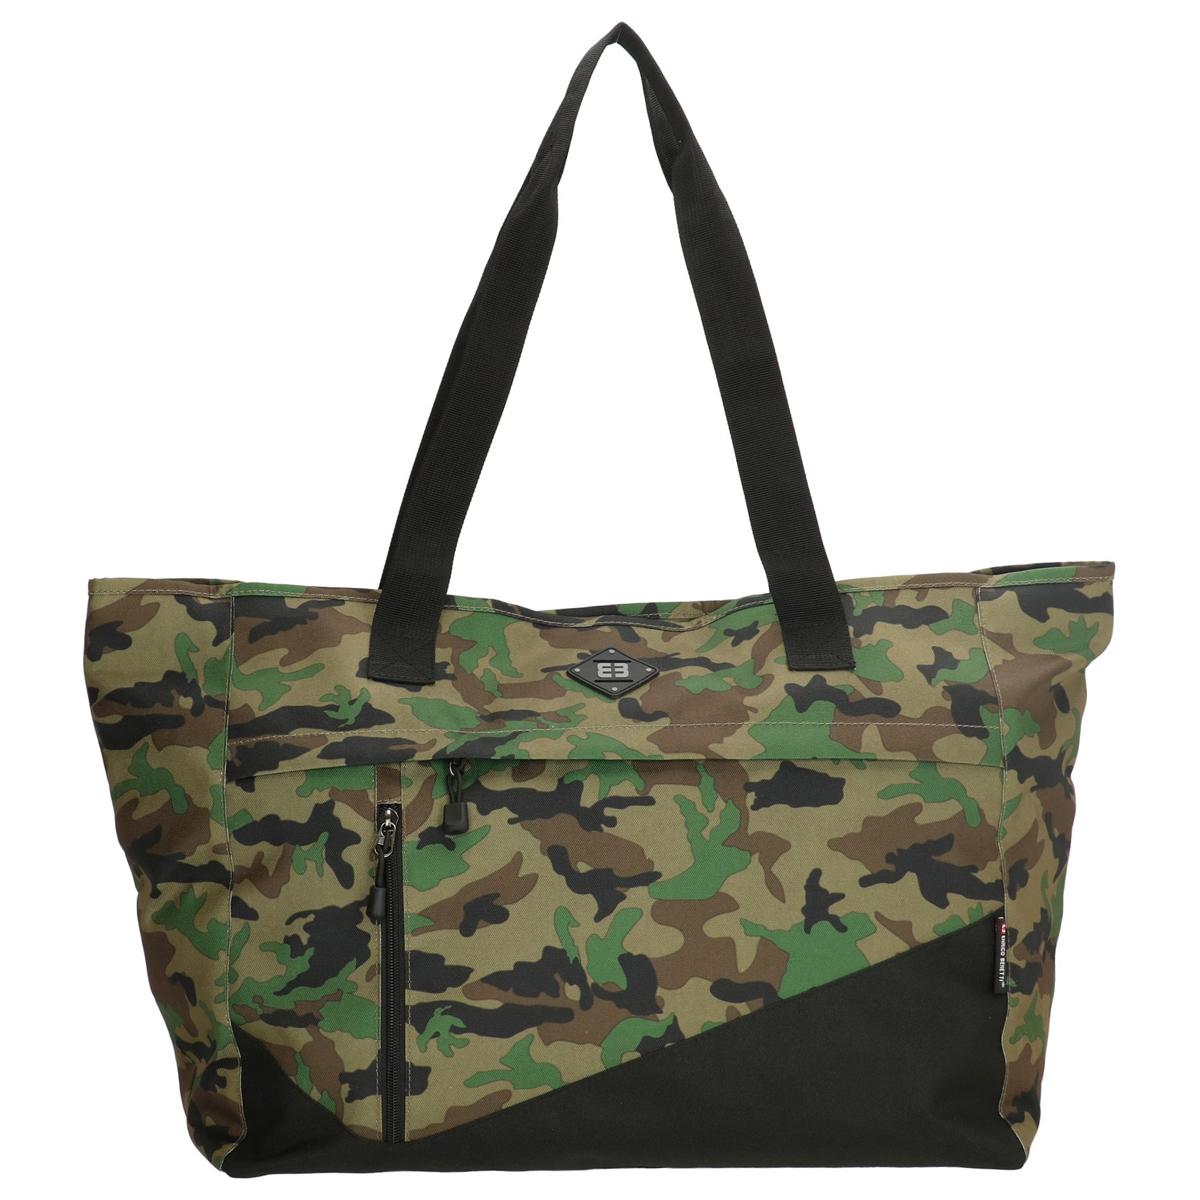 Sac cabas \'Enrico Benetti\' vert camouflage - 45x36x18 cm - [Q1741]